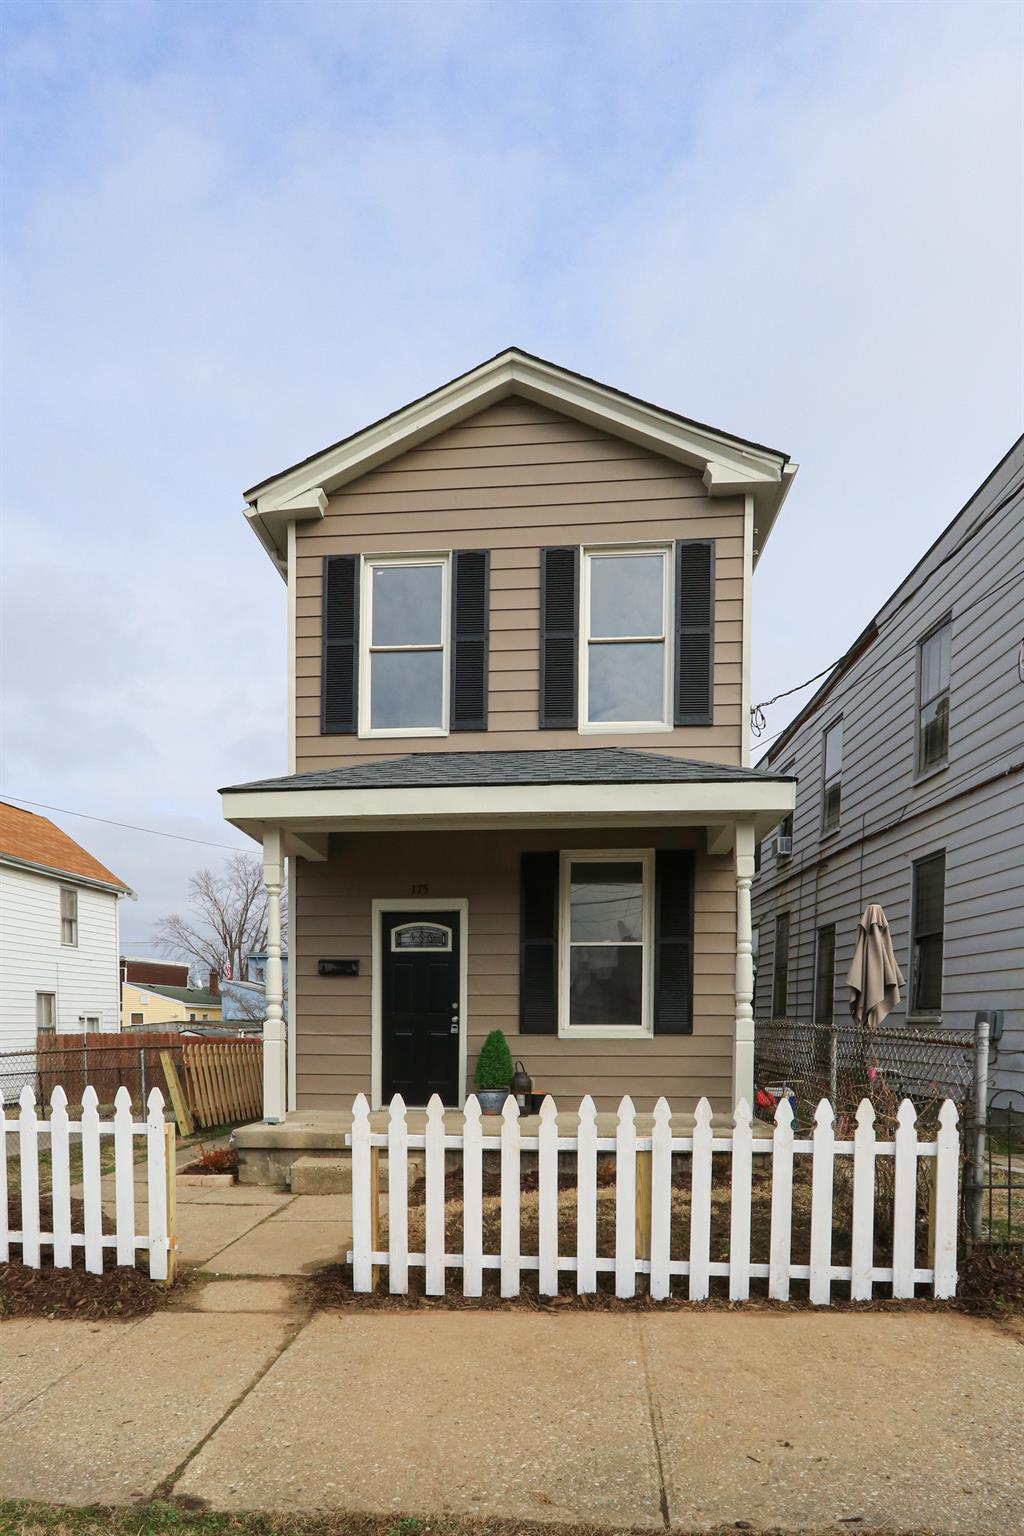 Exterior (Main) 2 for 175 Van Voast Ave Bellevue, KY 41073